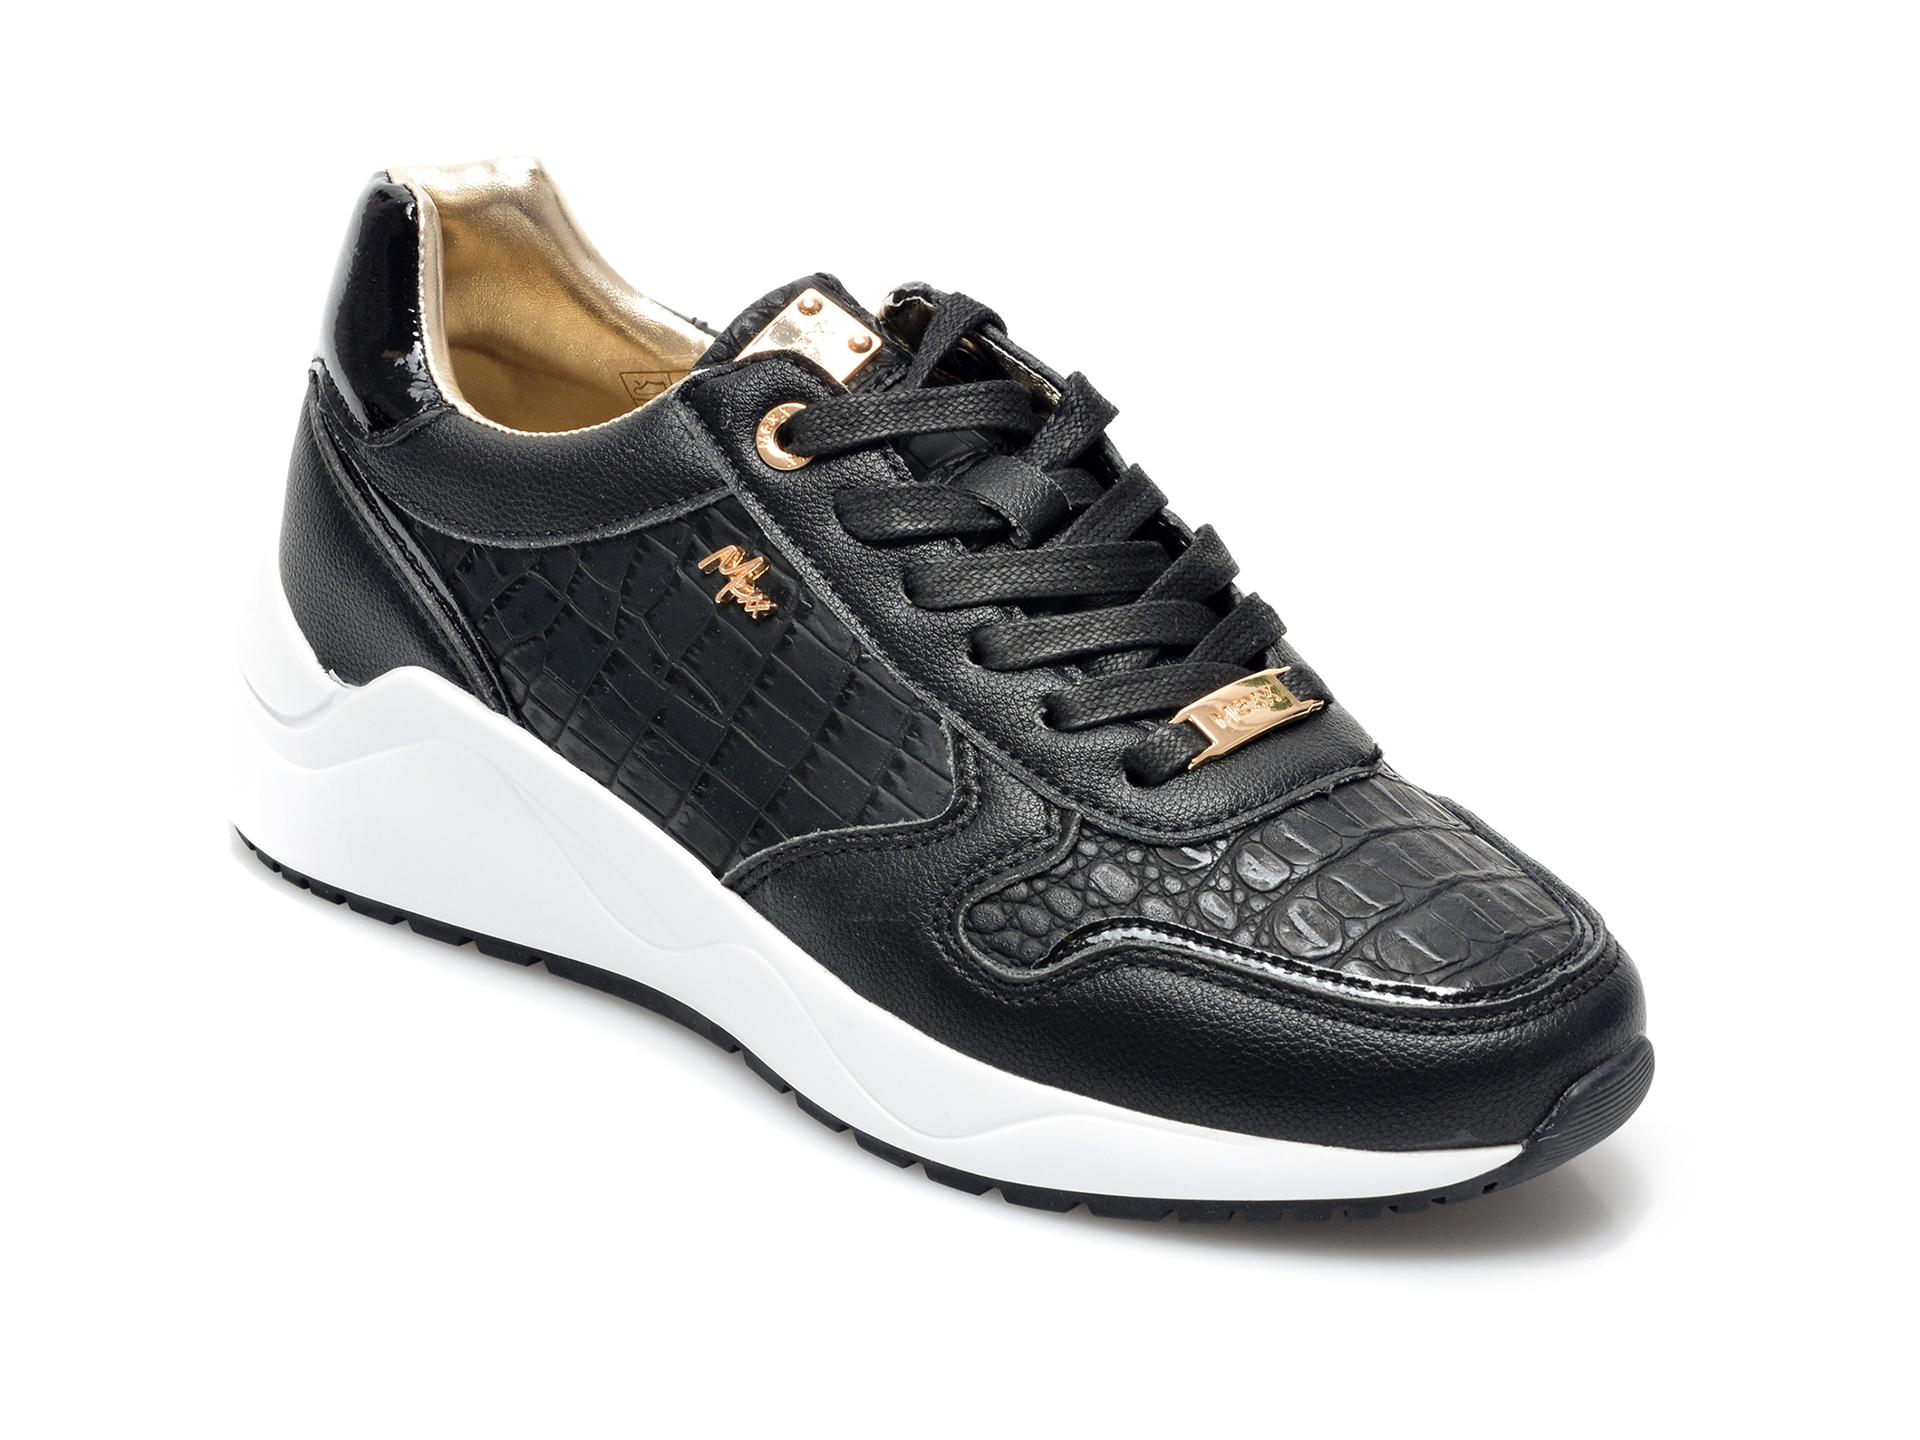 Pantofi sport MEXX negri, K0219, din piele ecologica